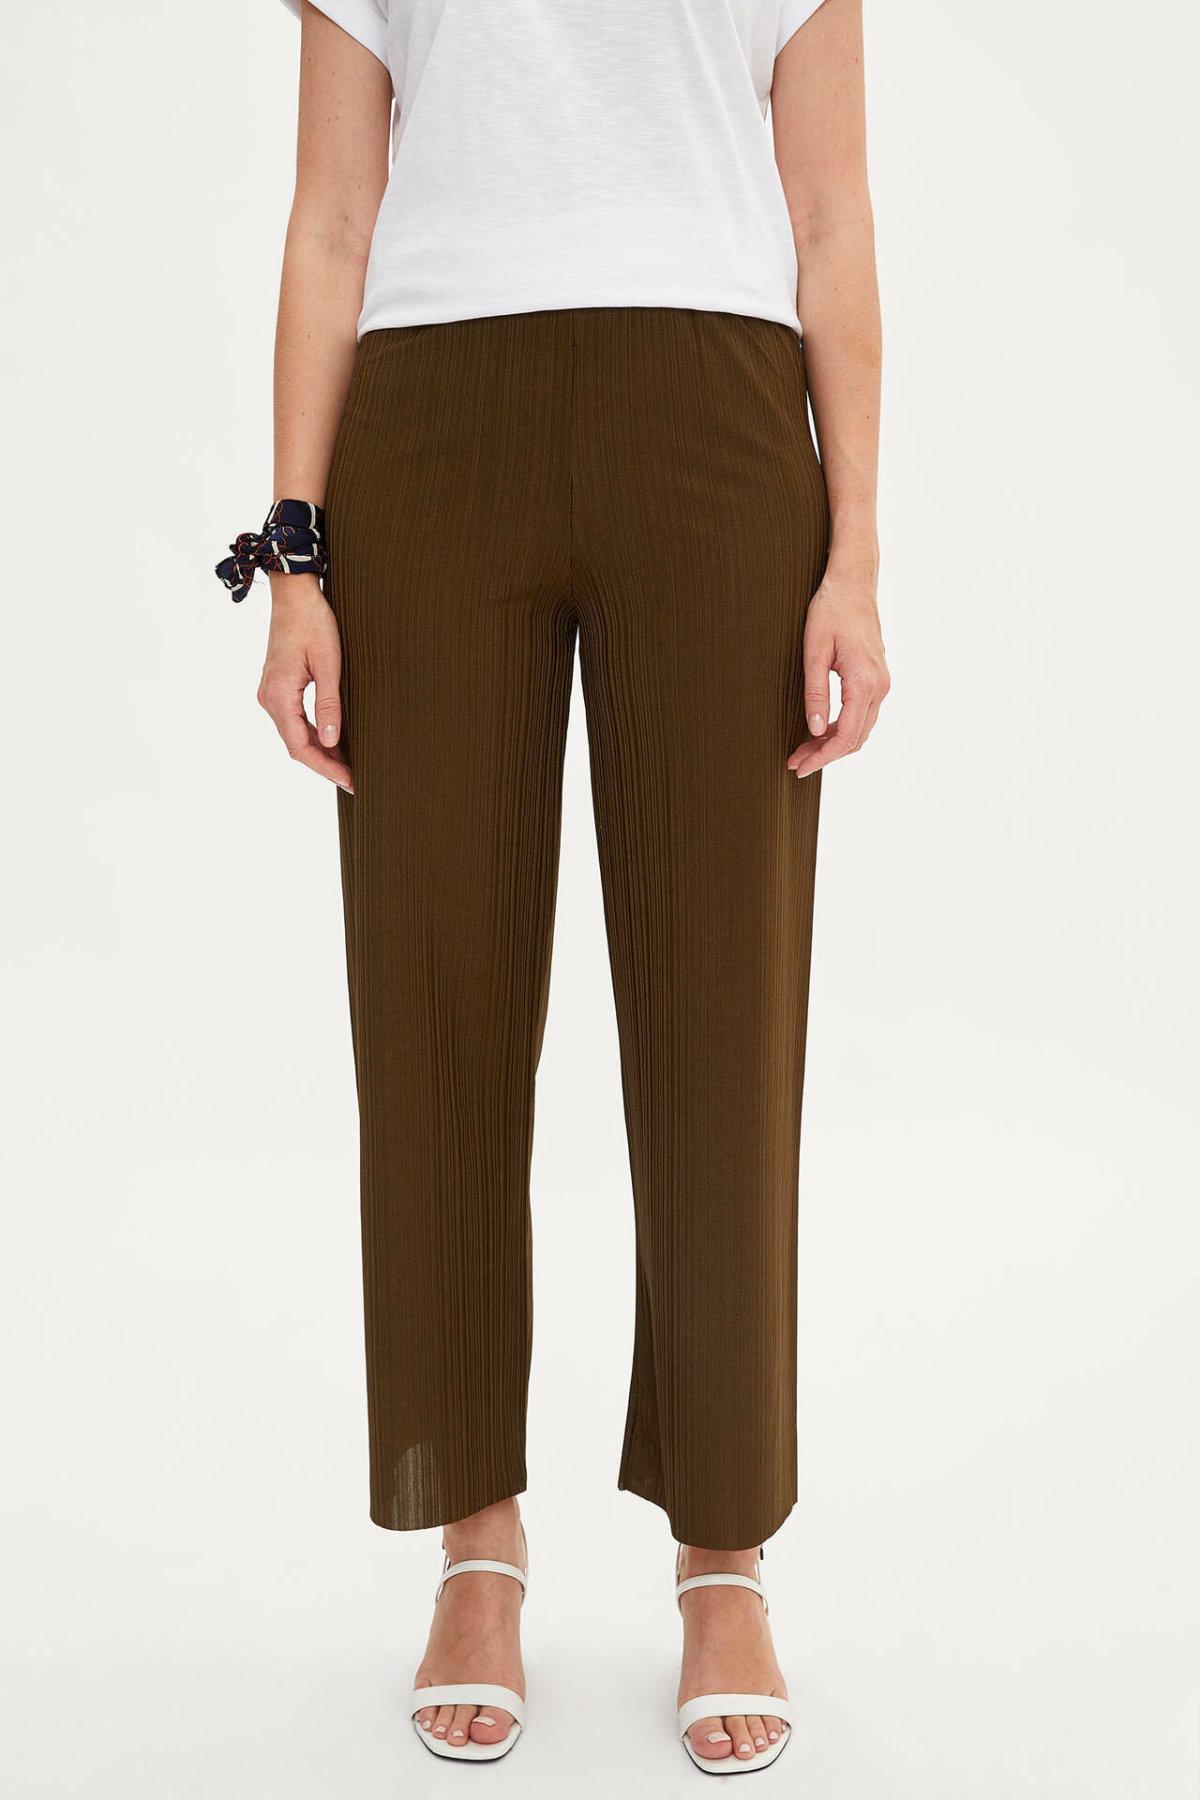 DeFacto New Female Fashion Trousers Ladies Casual Long Pants Comfort Straight Comfort Loose Pants Pure Color - L8471AZ19SM